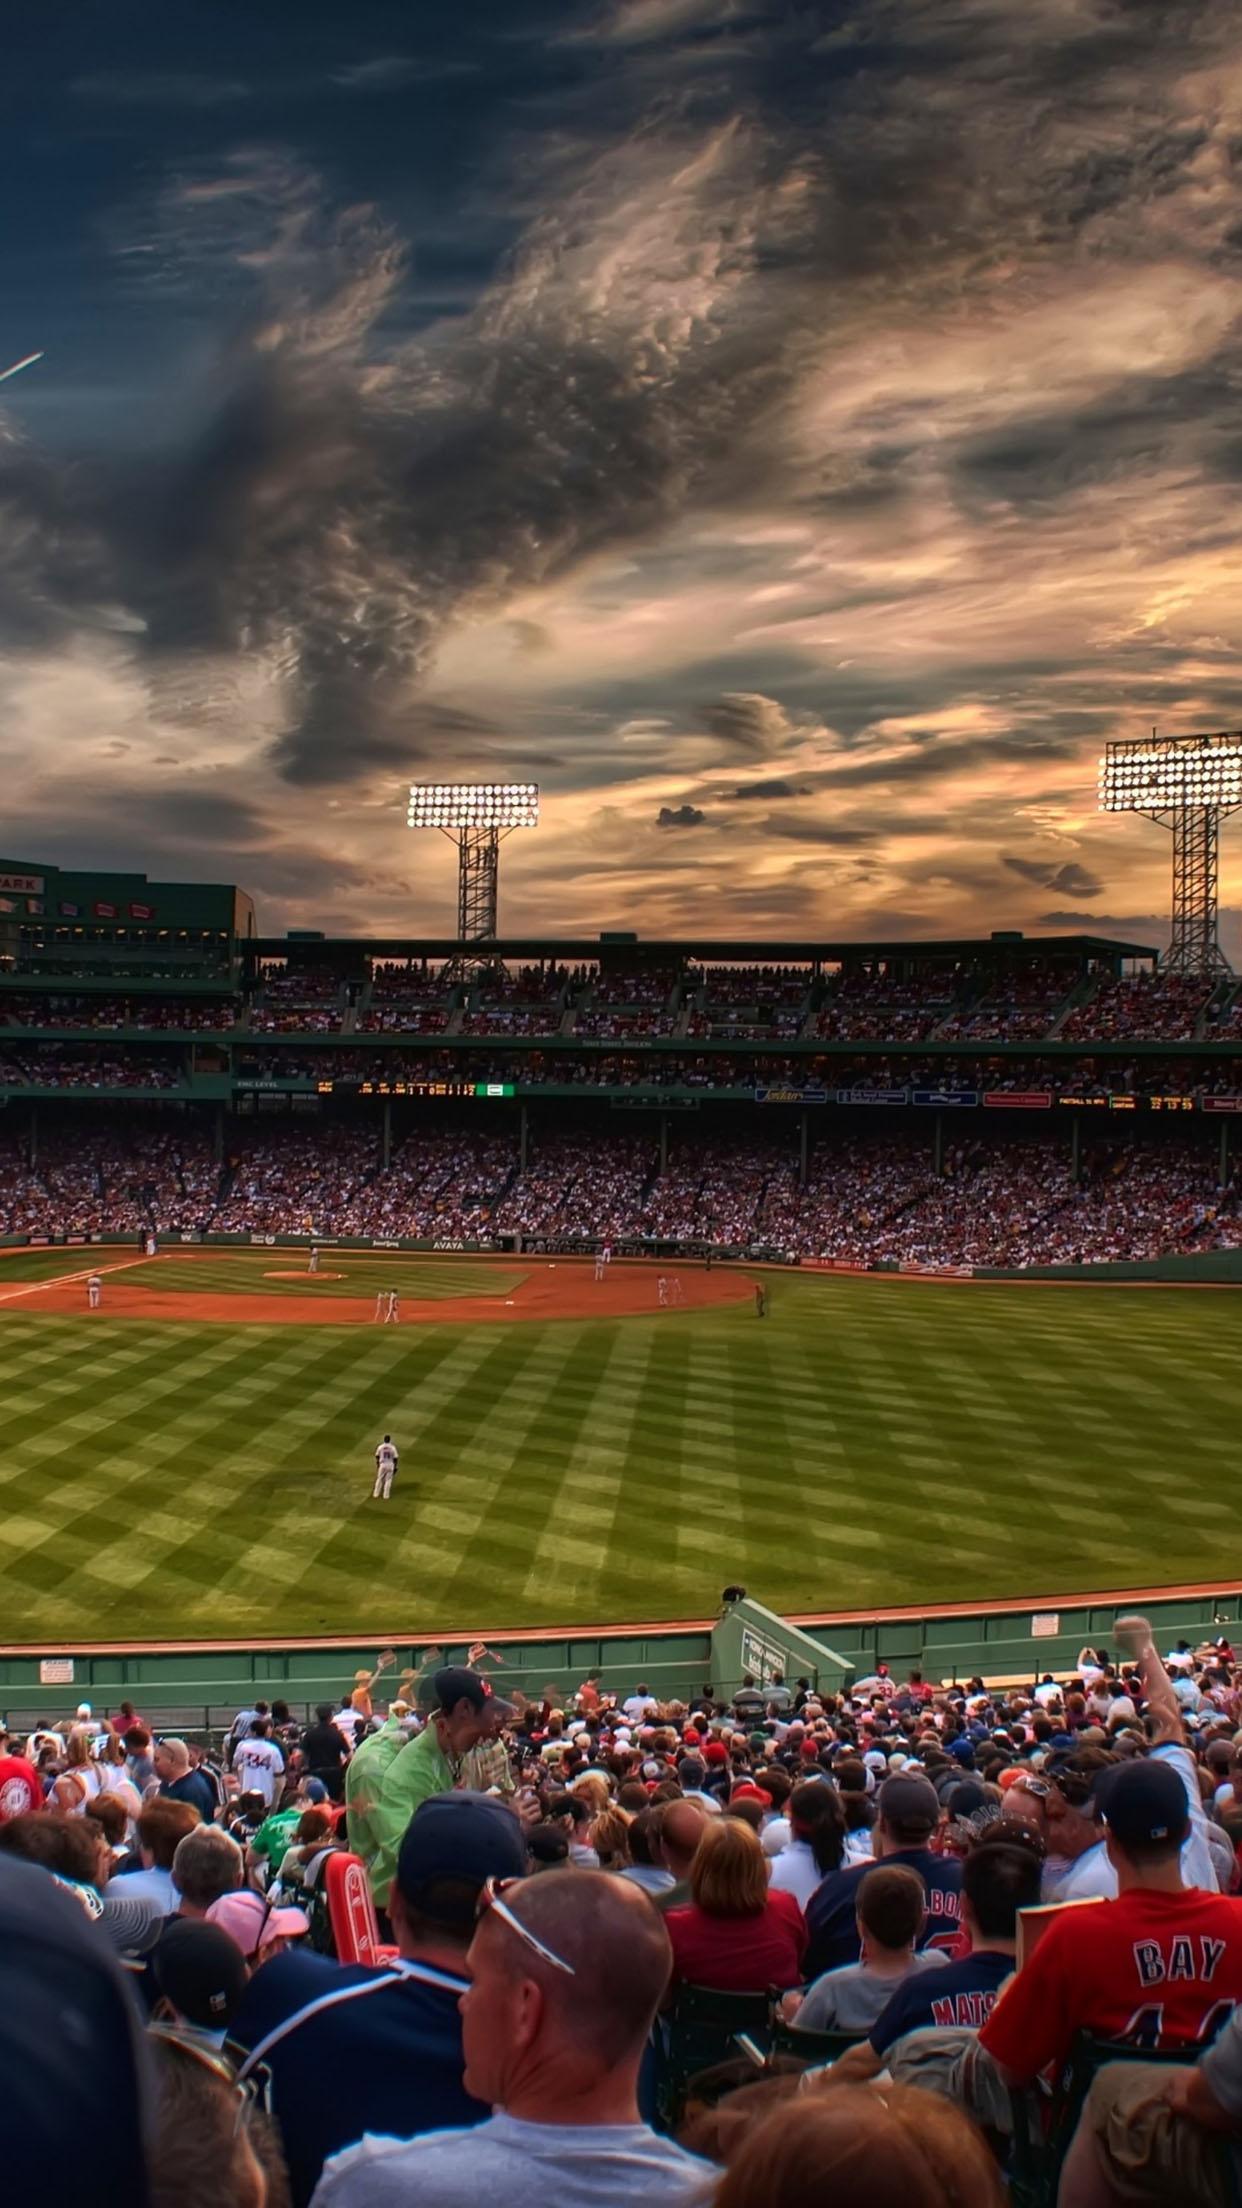 Baseball Baseball stadium 3Wallpapers iPhone Parallax Baseball stadium